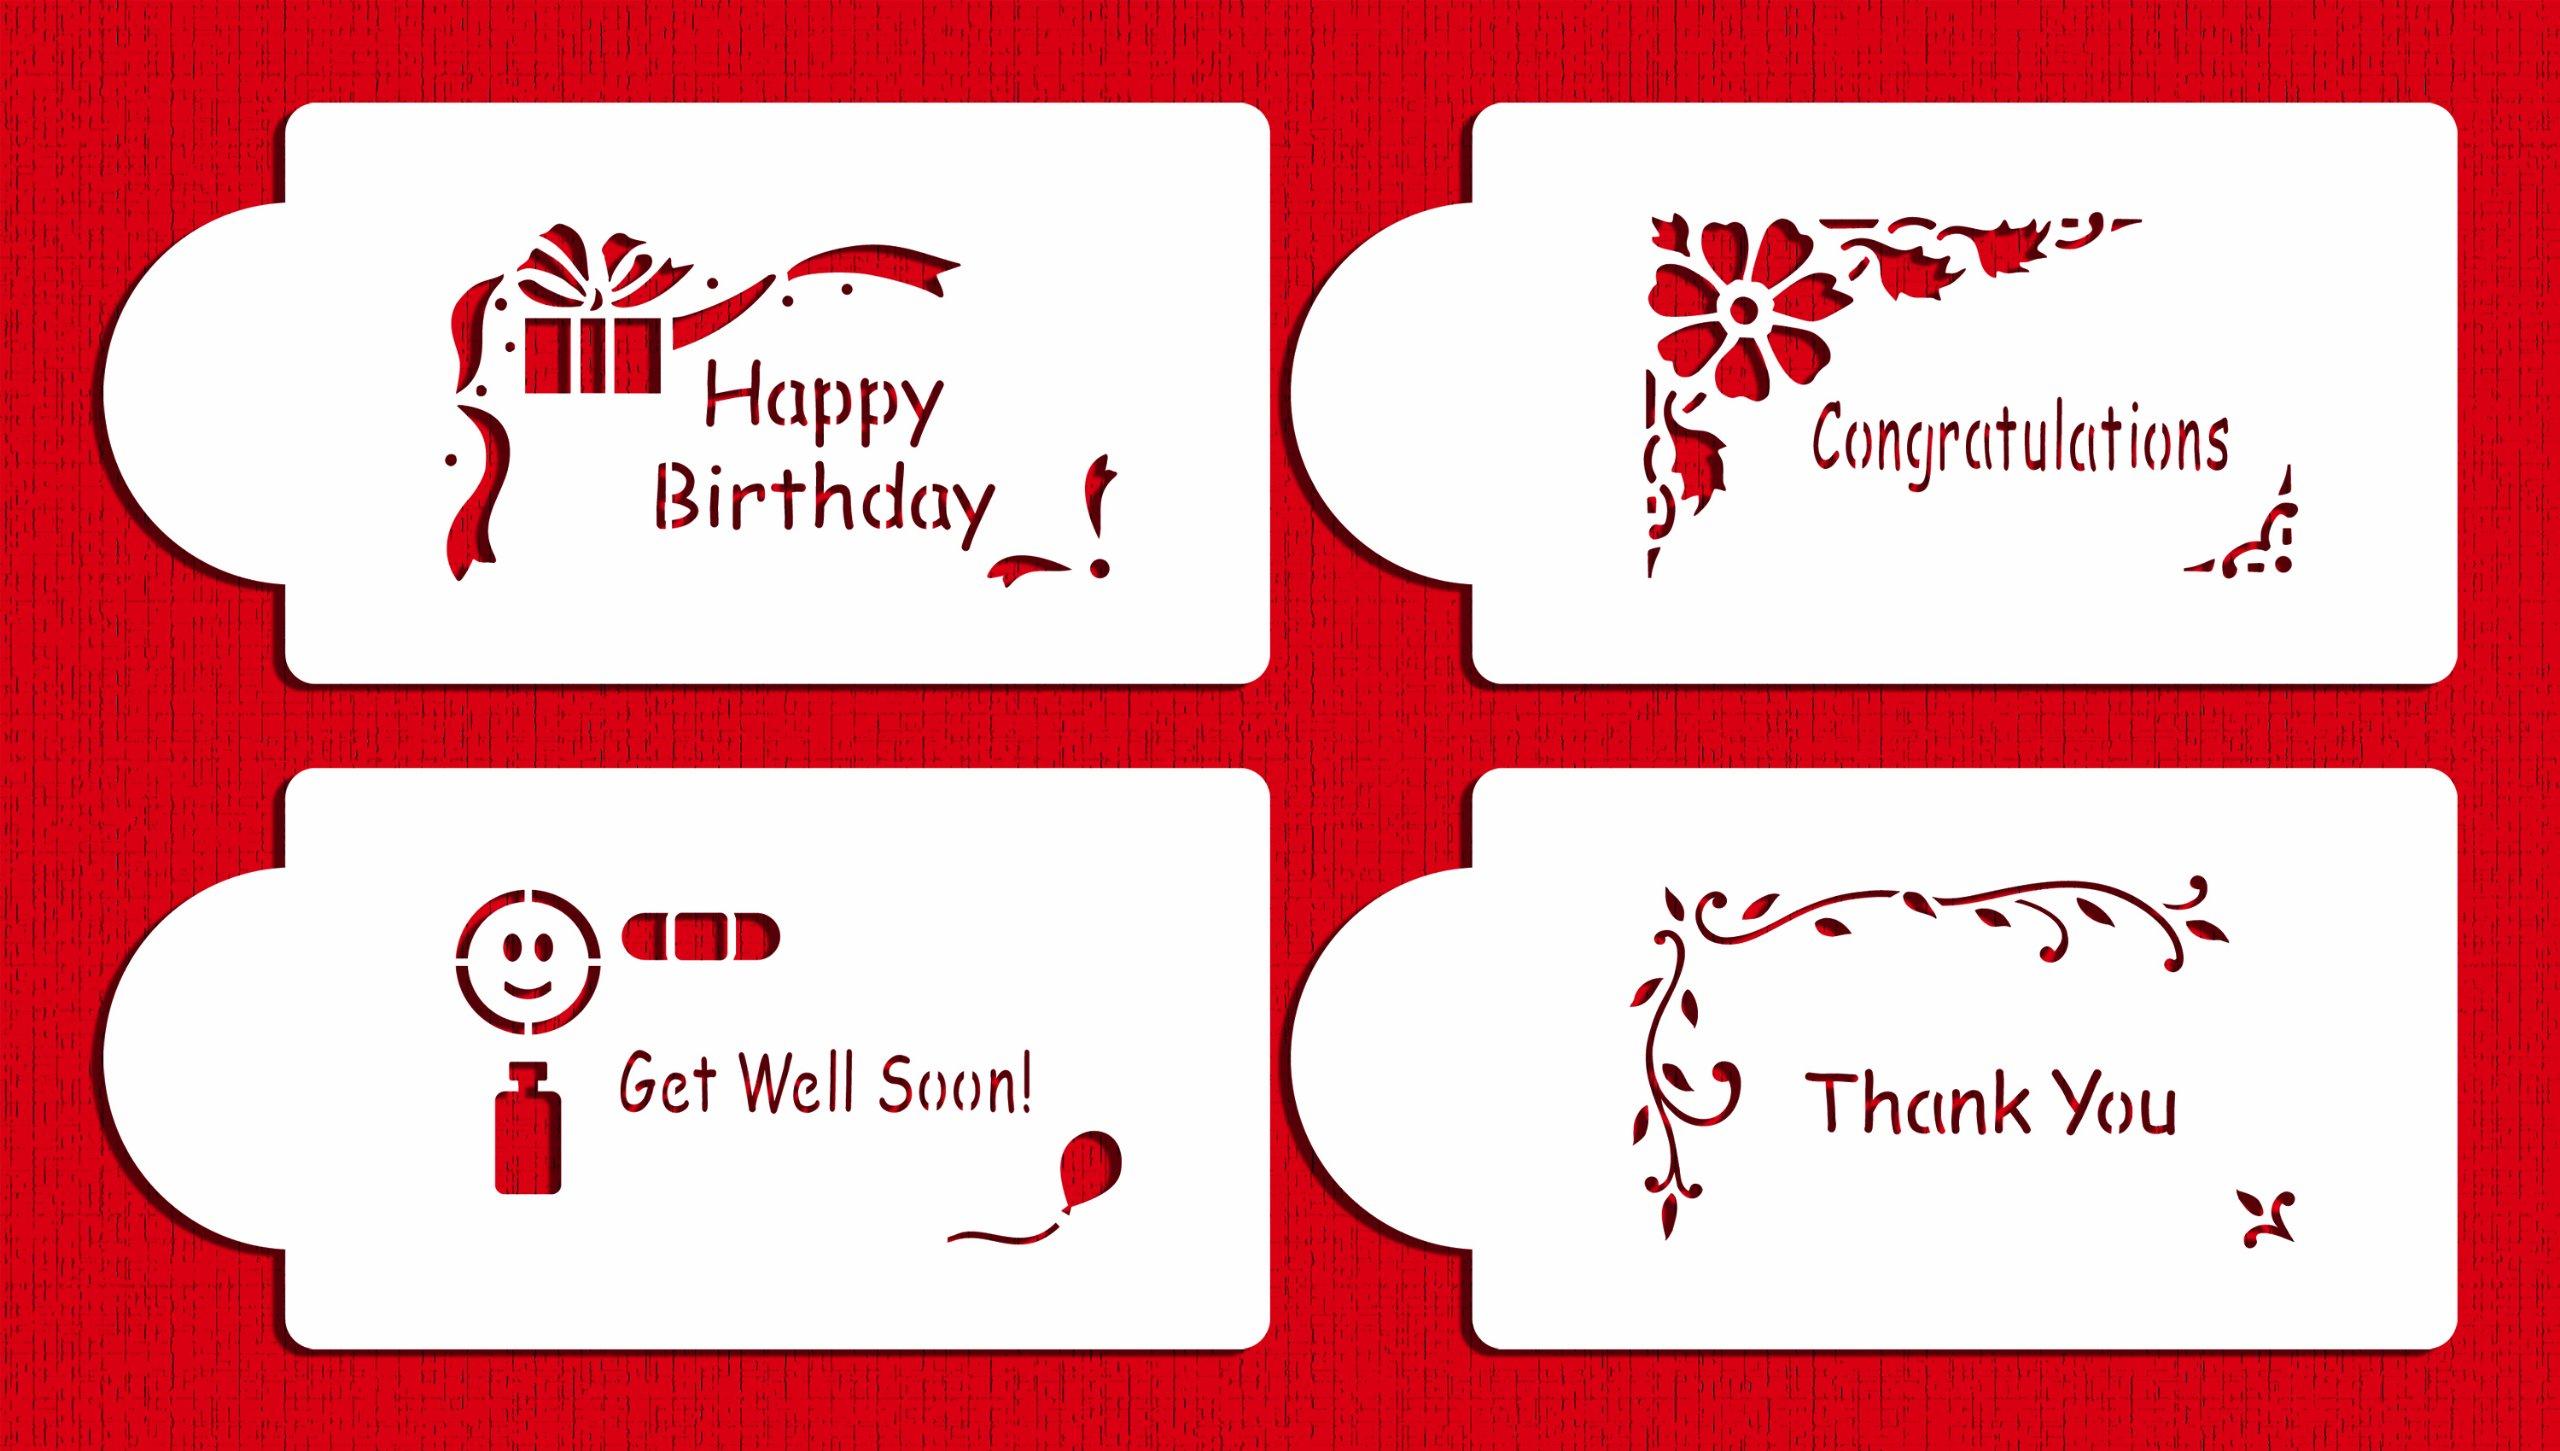 Designer Stencils C309 Celebration Corners Cookie Stencils, (Happy Birthday, Thank You, Congratulations, Get Well Soon), Beige/semi-transparent